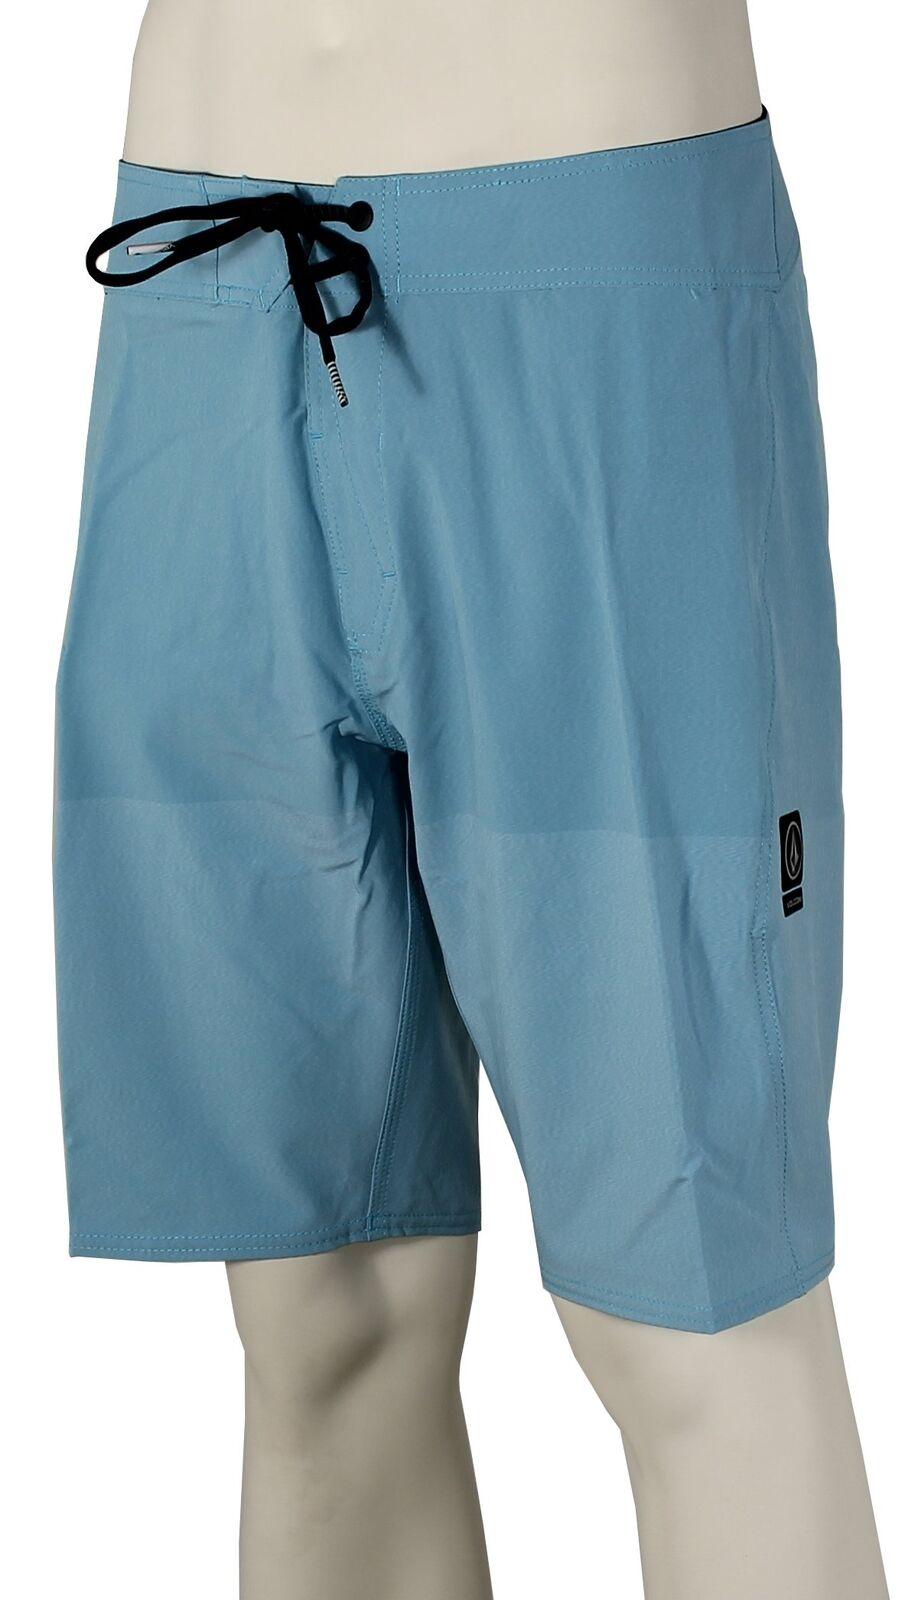 Volcom Lido Heather Mod Boardshorts - Neon bluee - New